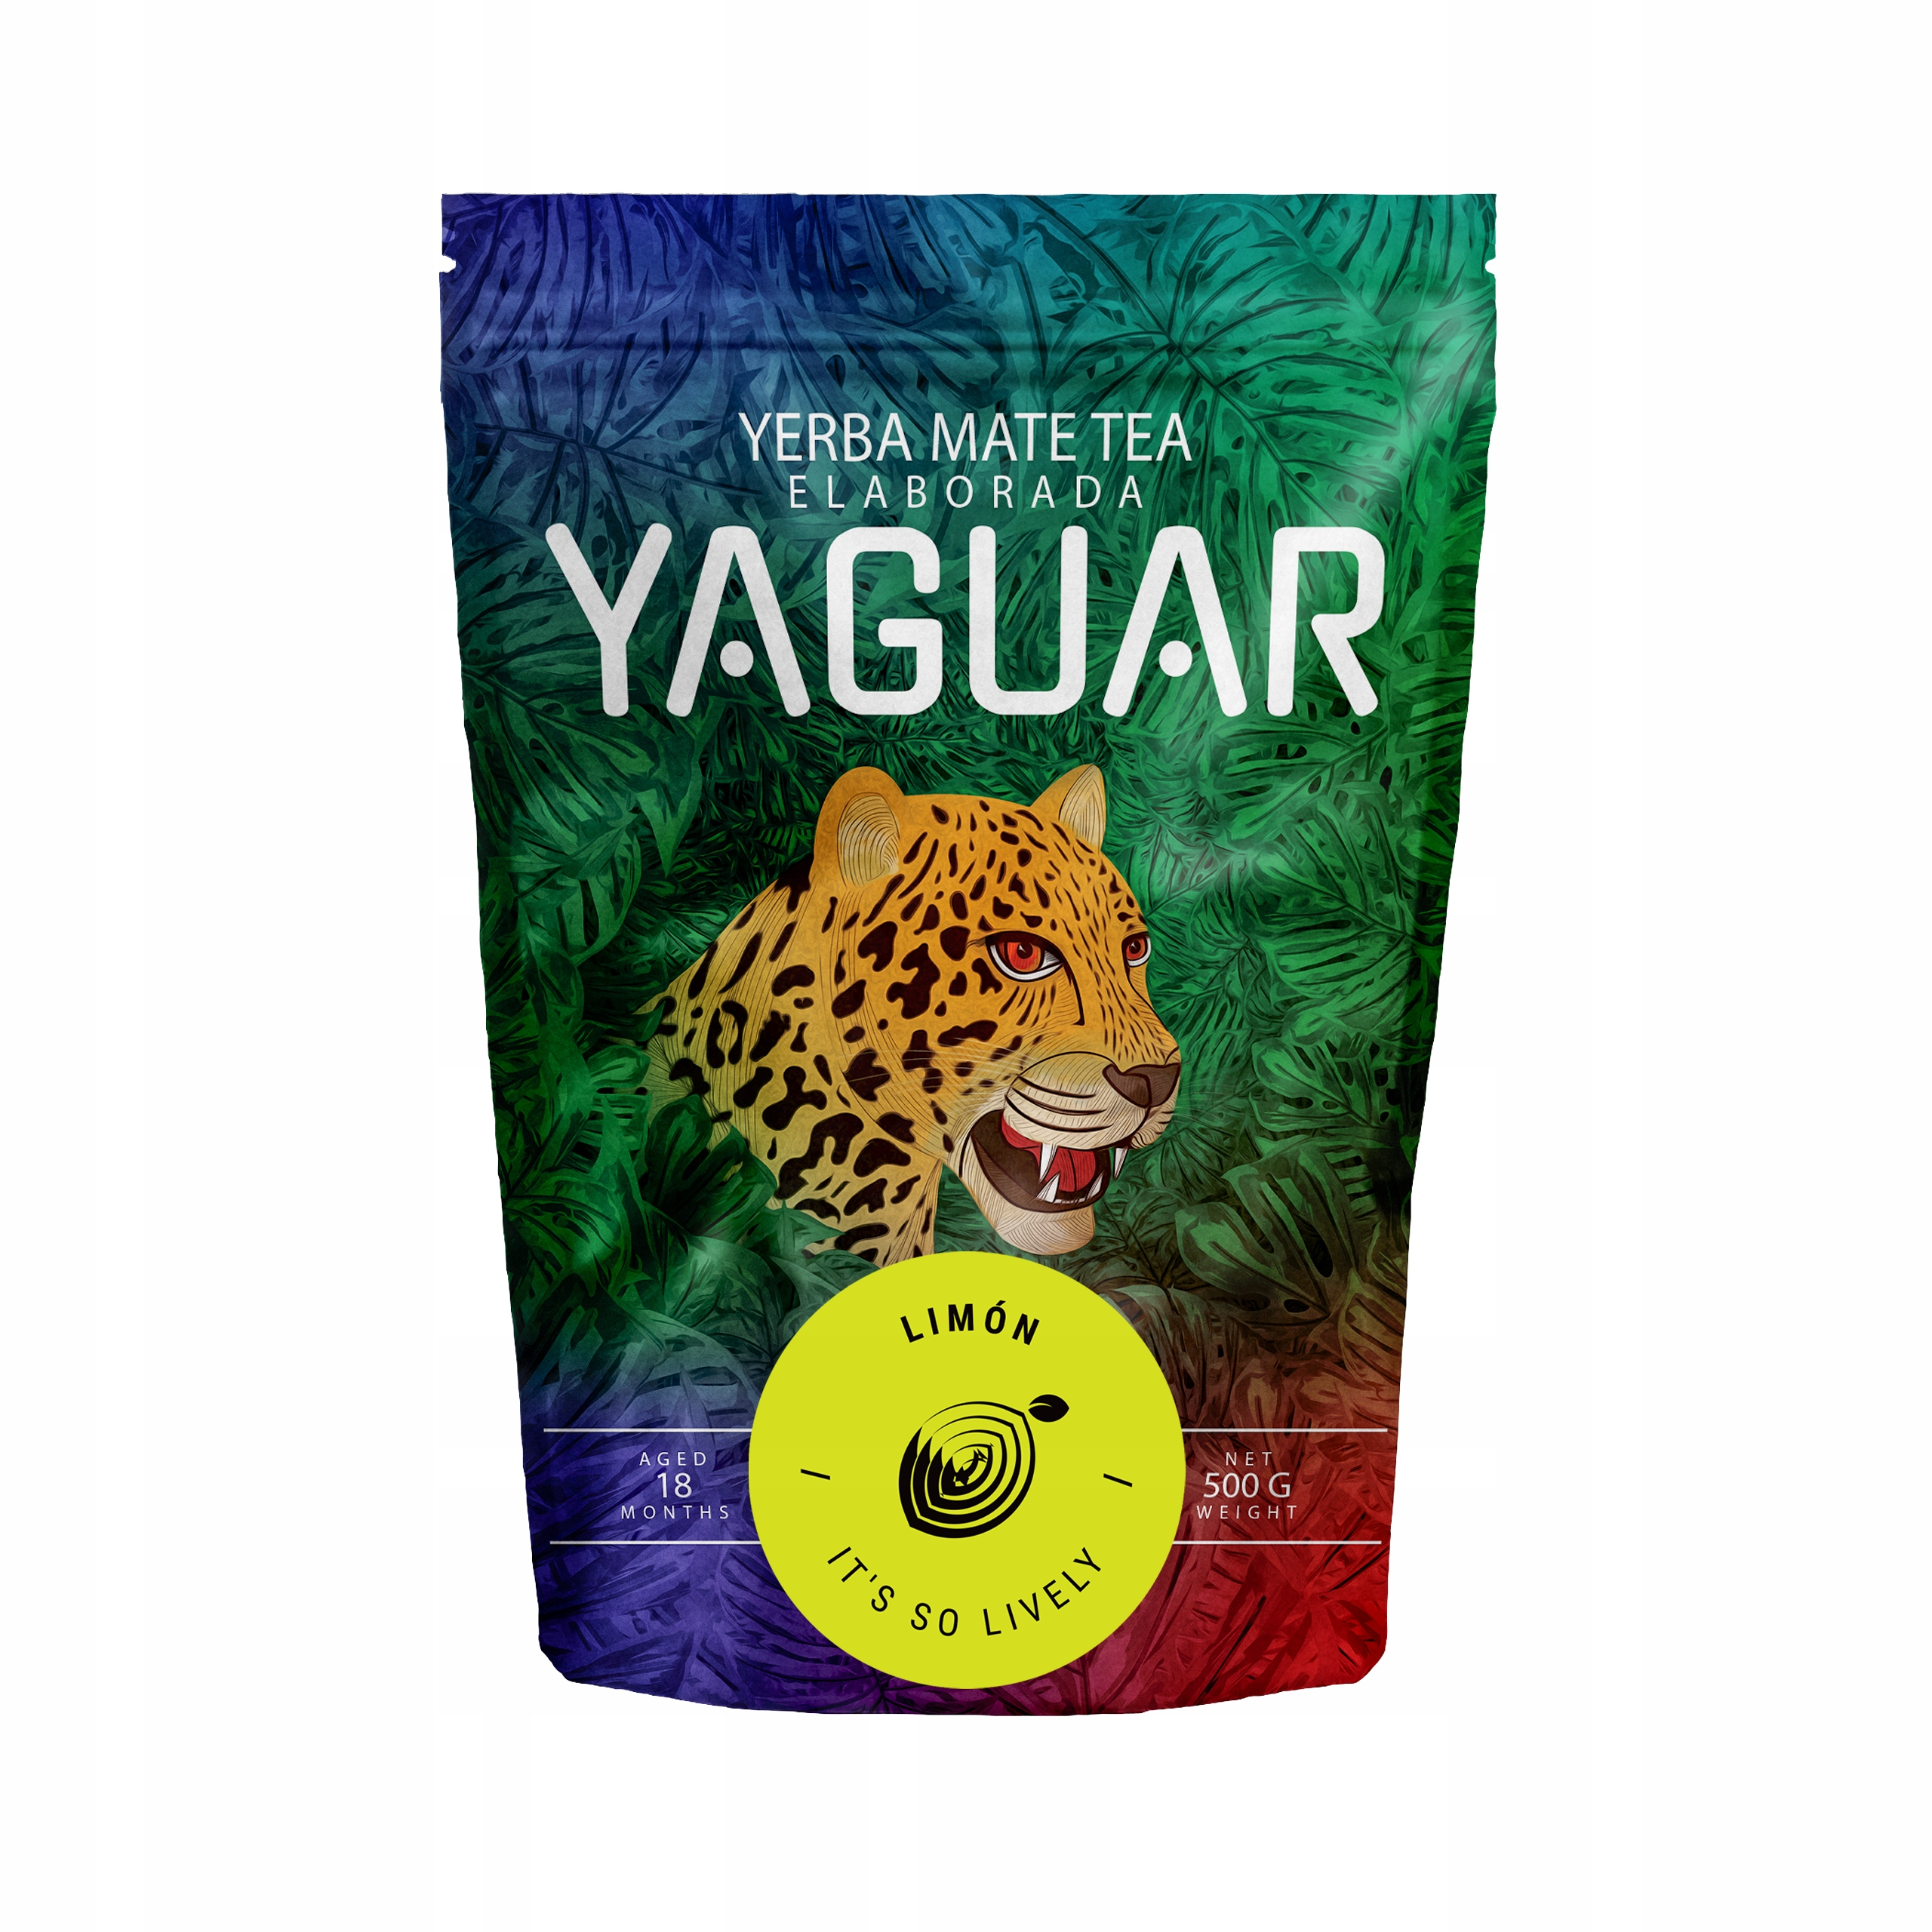 Yerba Mate Yaguar Limon Cytrynowa 0,5kg 500g